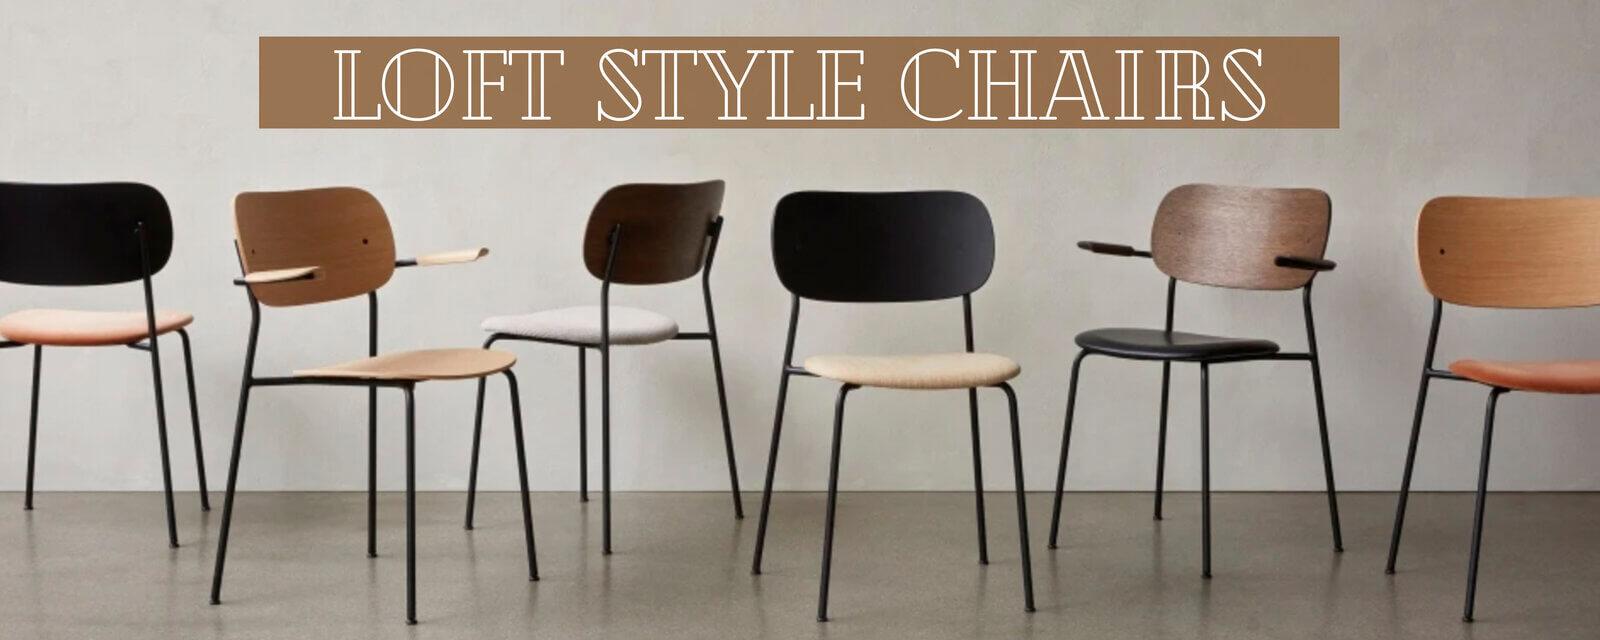 Loft Style | Chairs